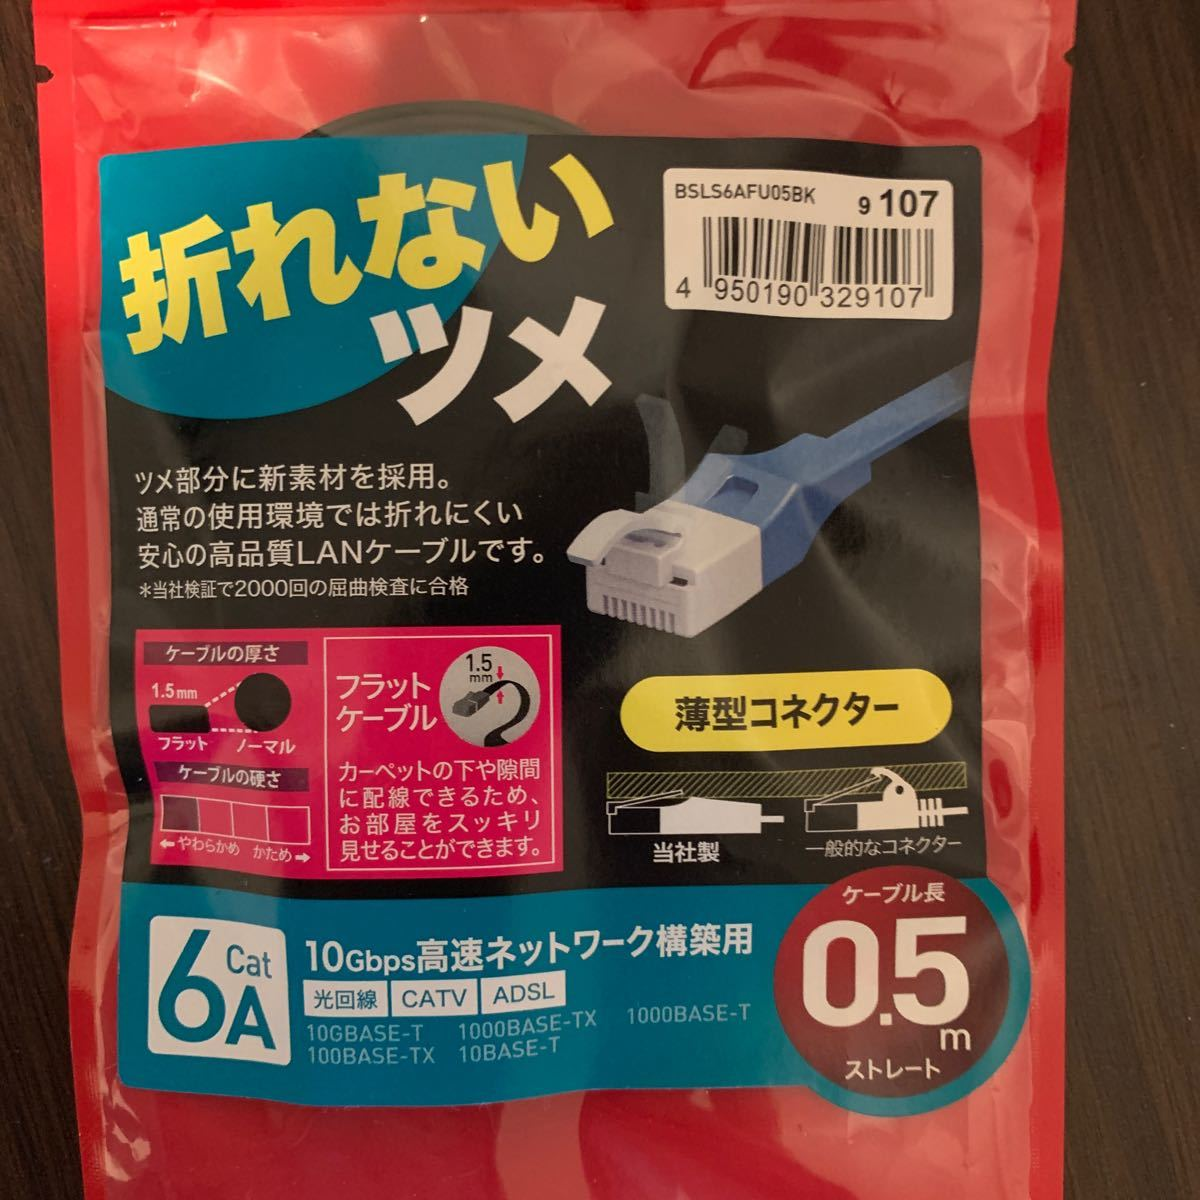 LANケーブル ケーブル長0.5m LANケーブル BUFFALO 【未開封・未使用】